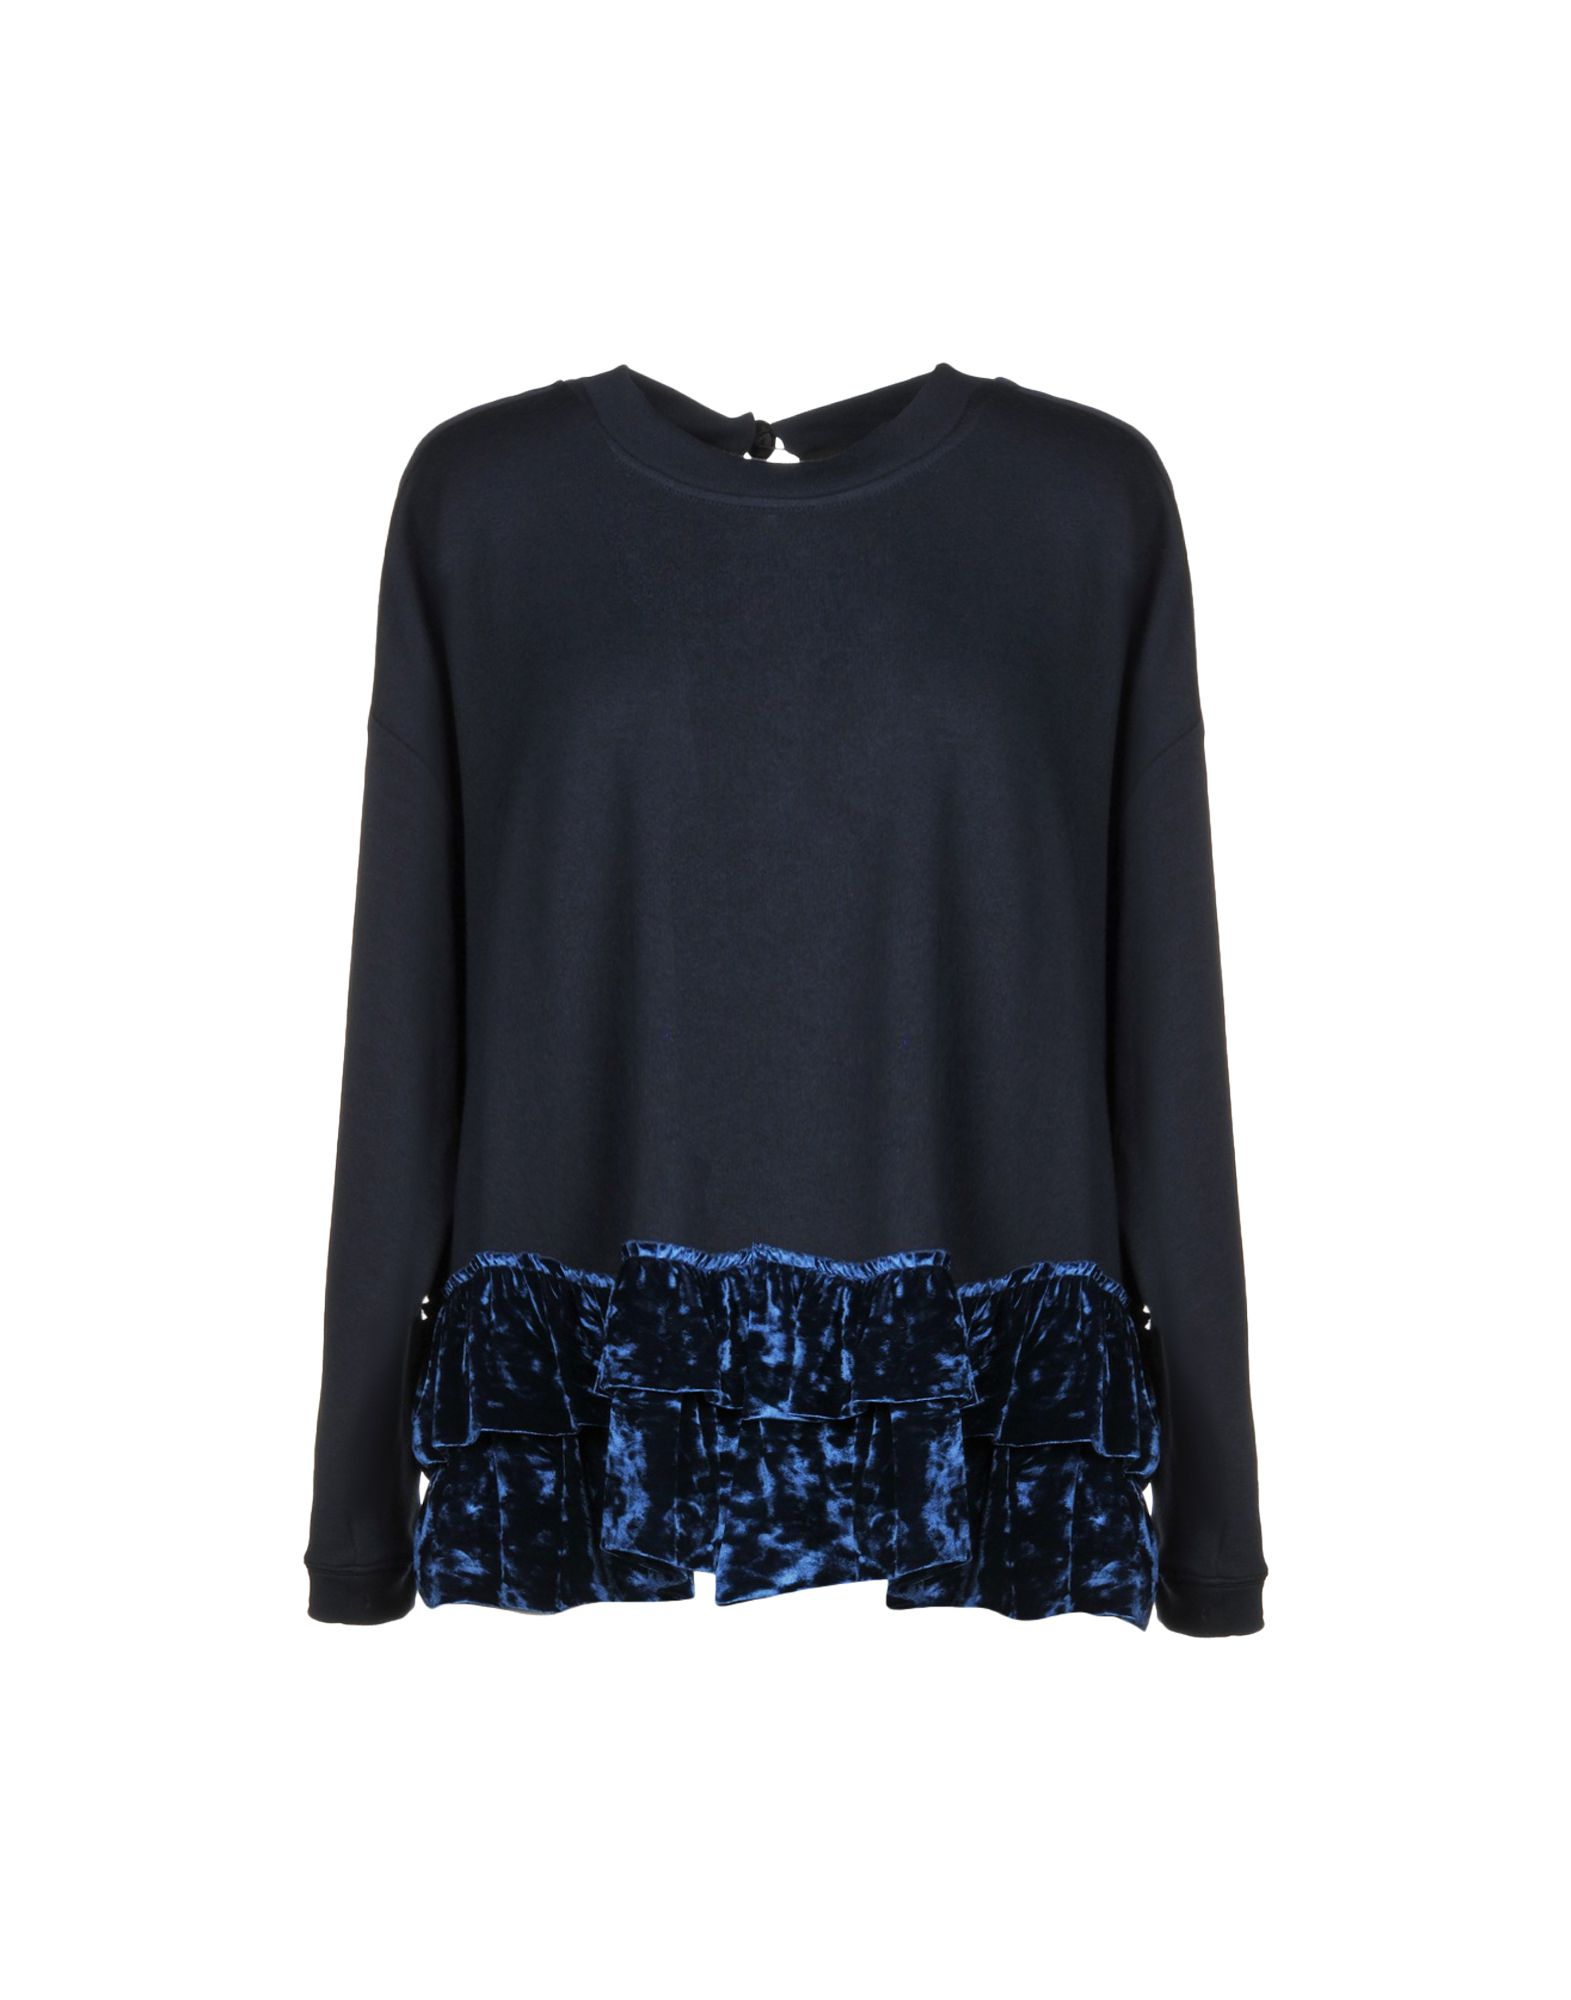 TILL.DA Sweatshirt in Dark Blue